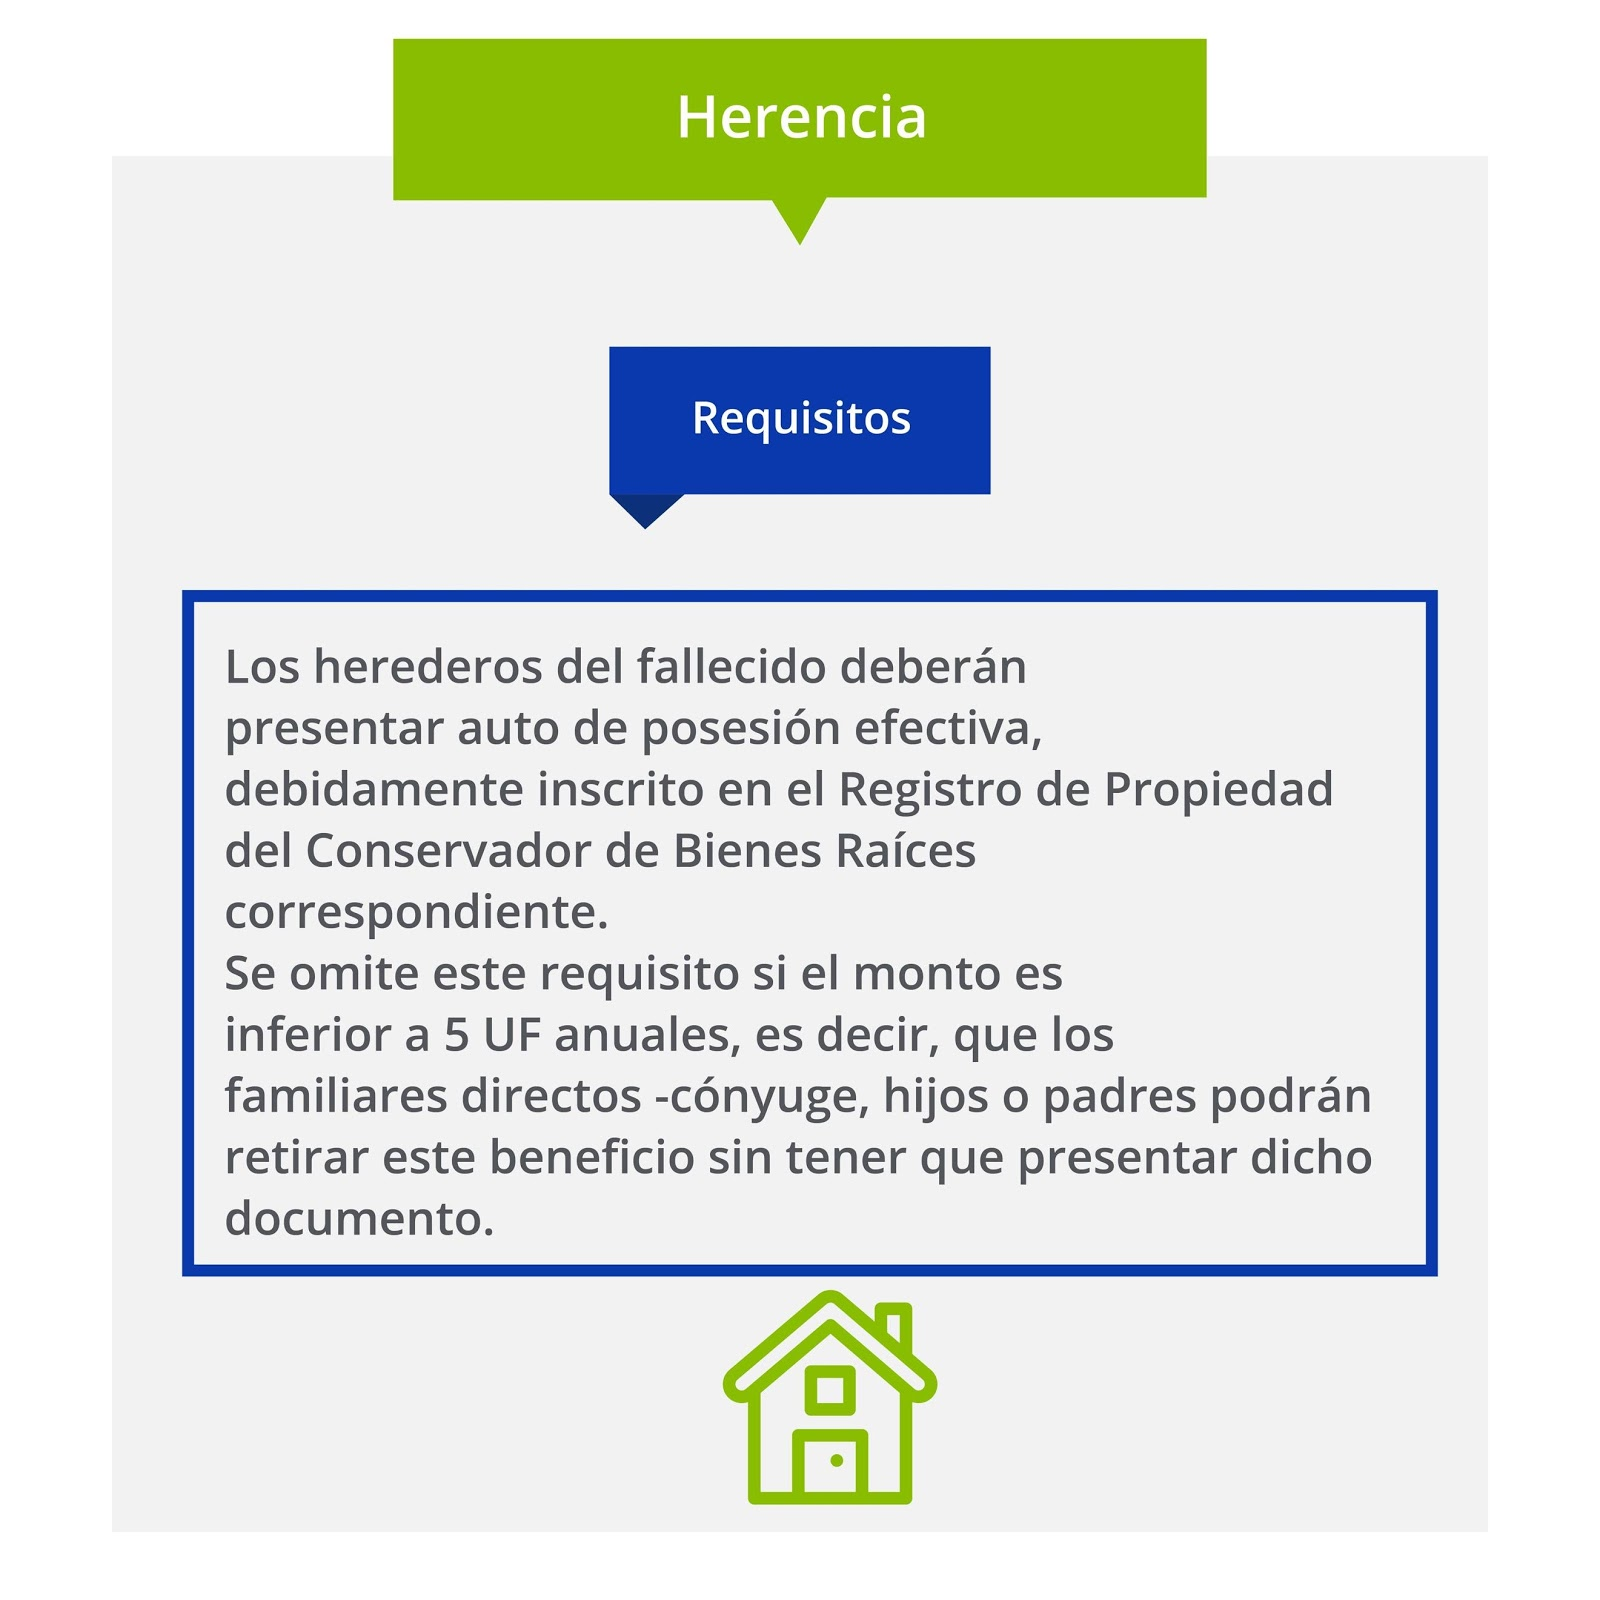 https://confiar.entuidioma.cl/hubfs/Nota_7_-_Herencia_jpg-07_(2).jpg